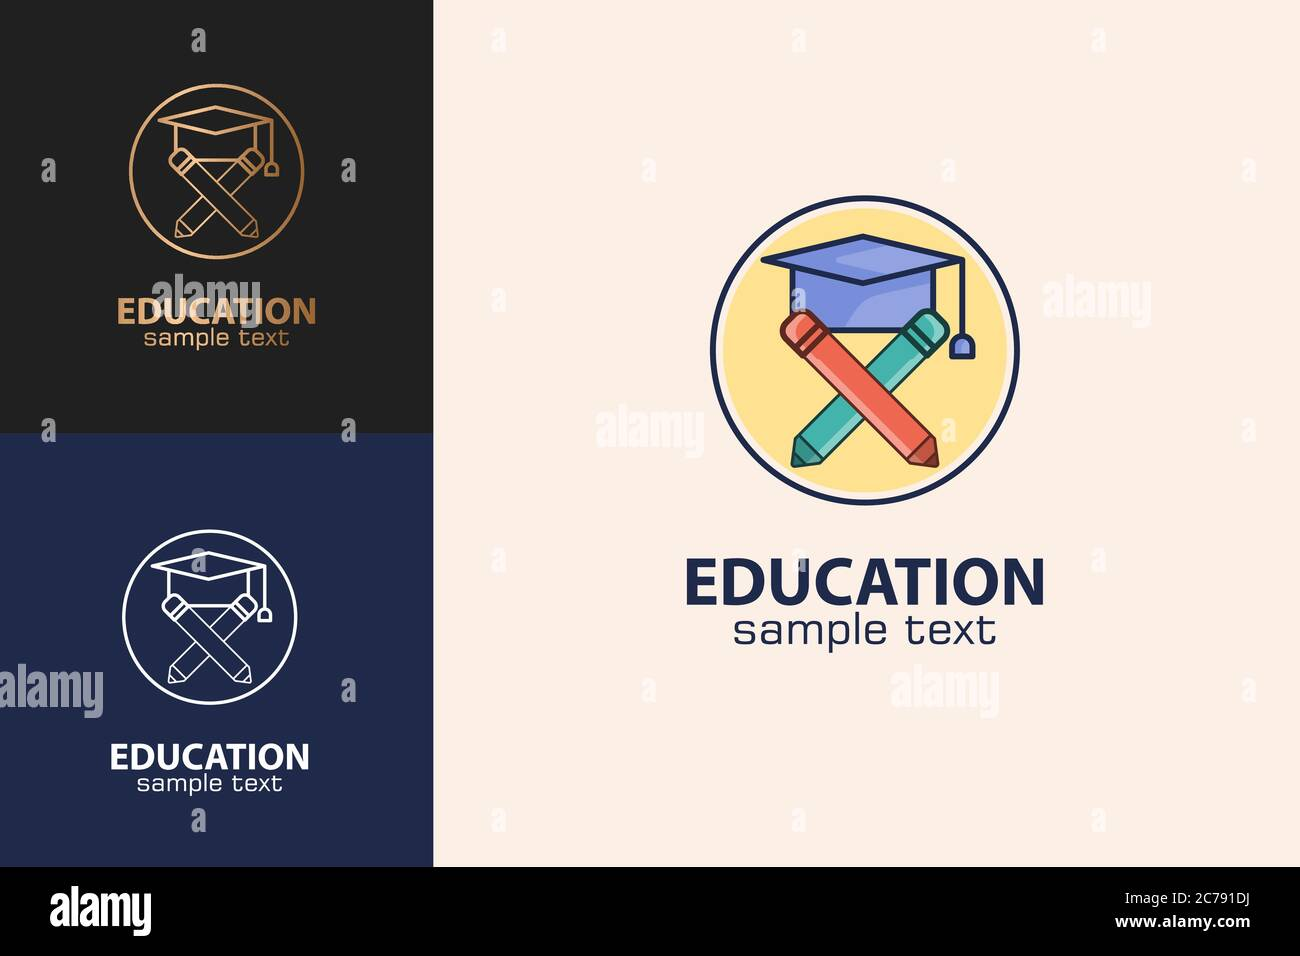 Education Logo, Graduation Hat And Pencil Design Concept. Stock Vector